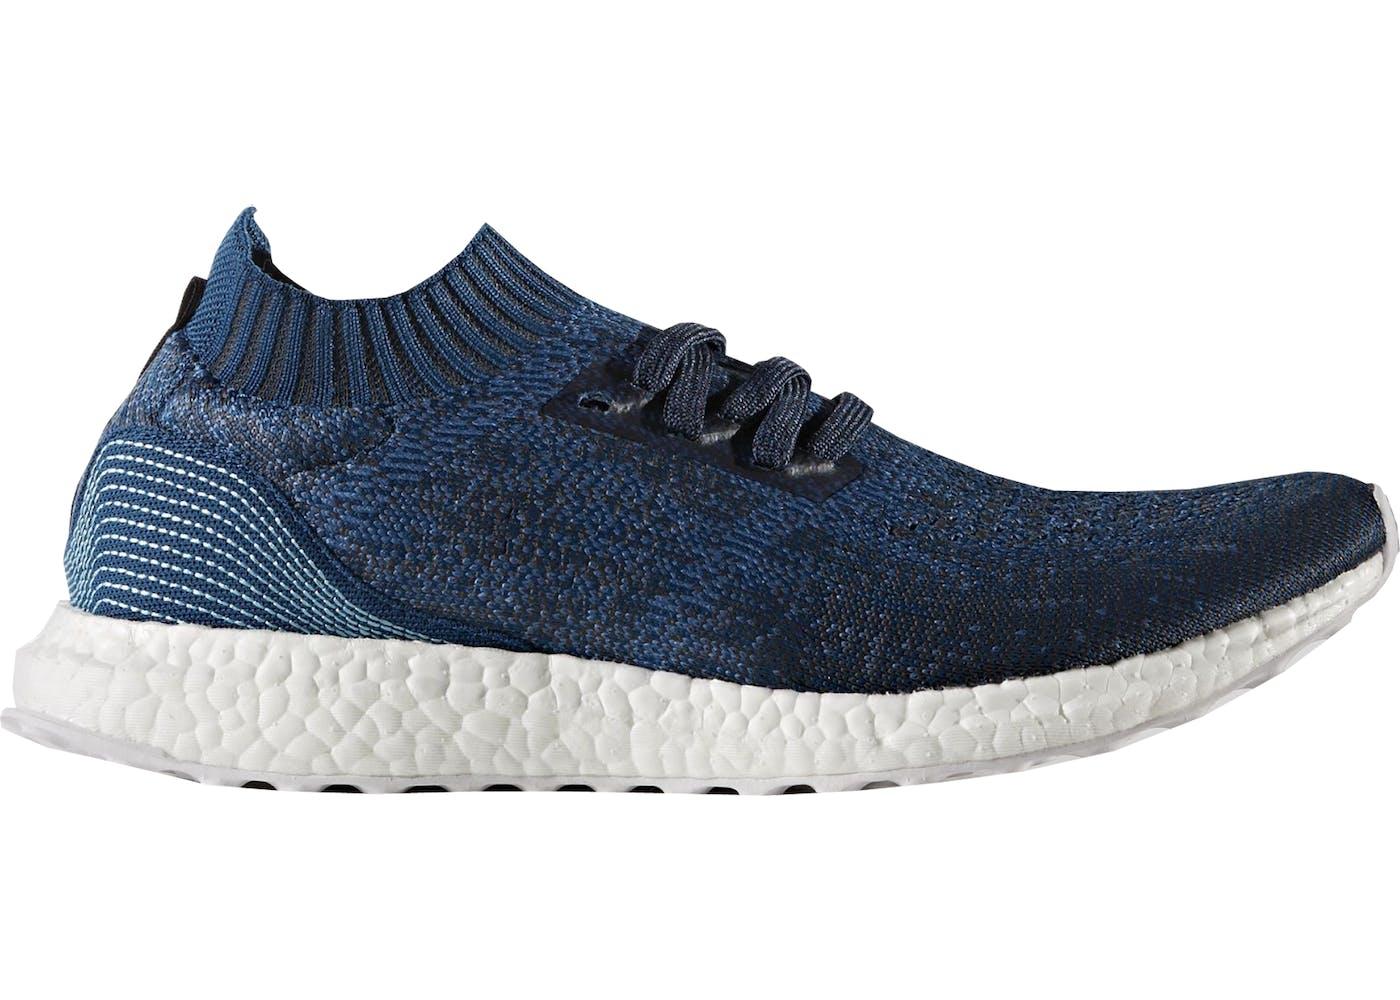 67% Off Adidas ultra boost 3.0 grey restock Size 6